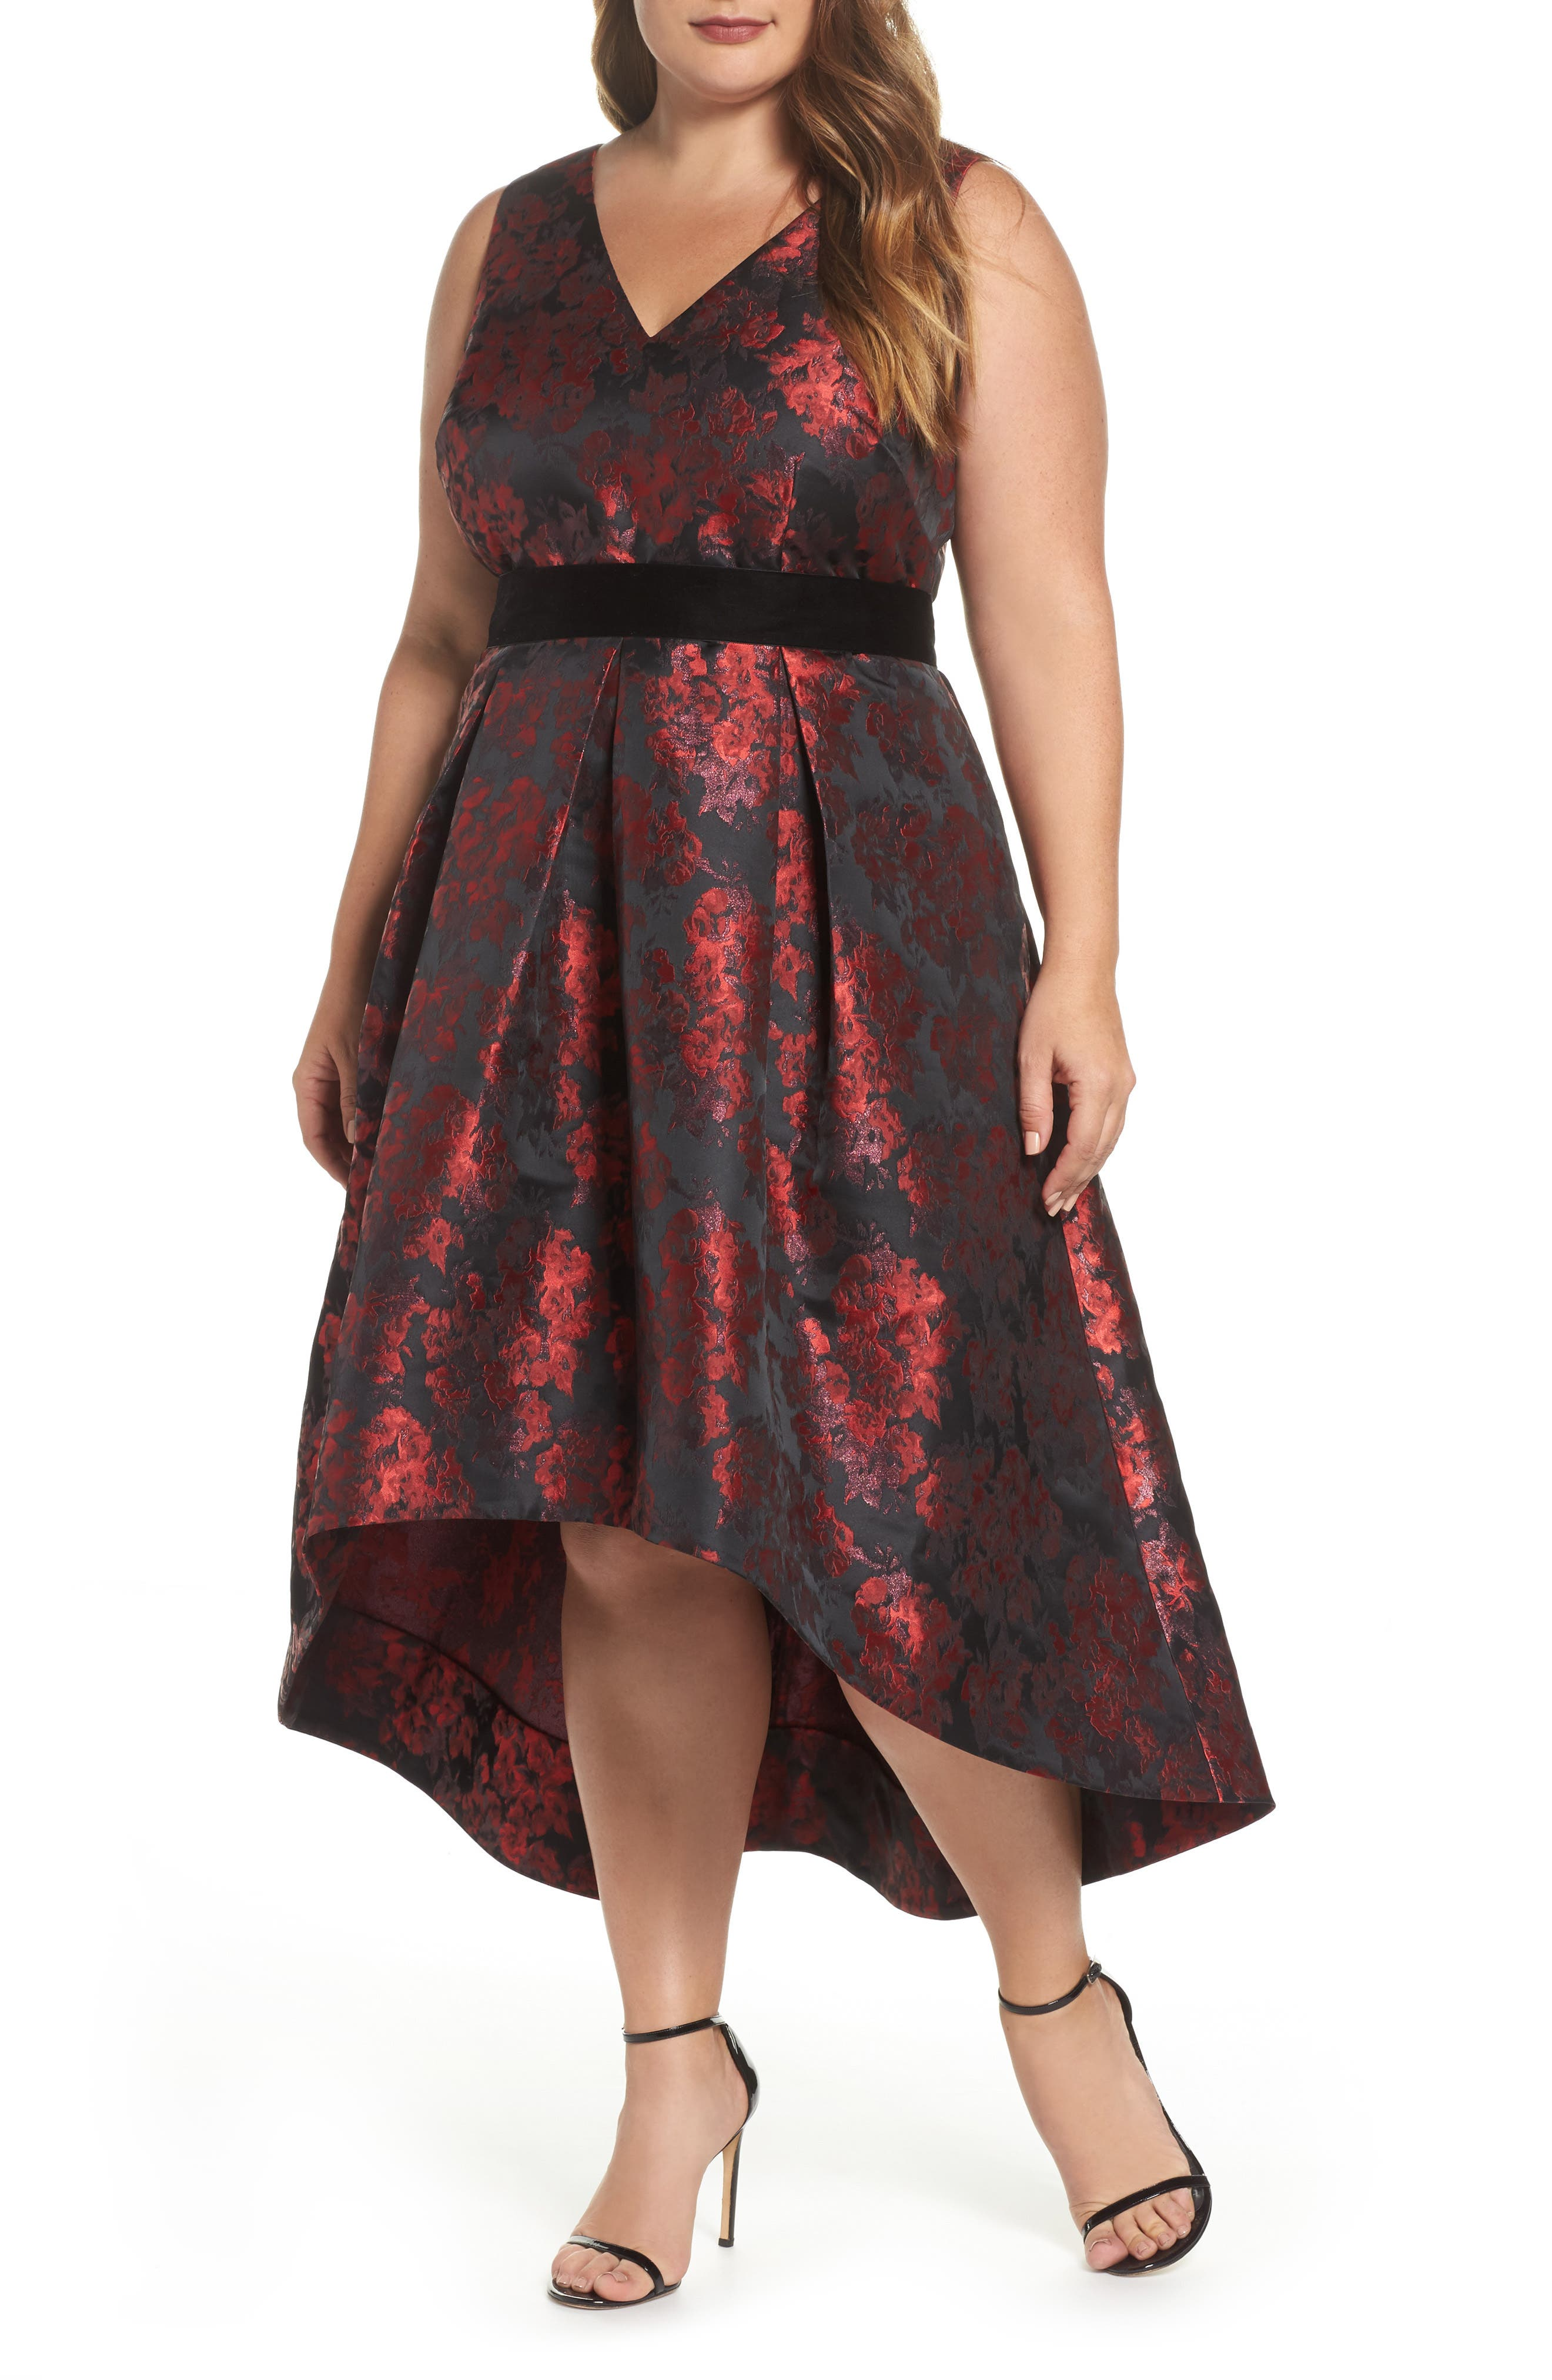 Alternate Image 1 Selected - Eliza J Sleeveless Jacquard High/Low Dress (Plus Size)